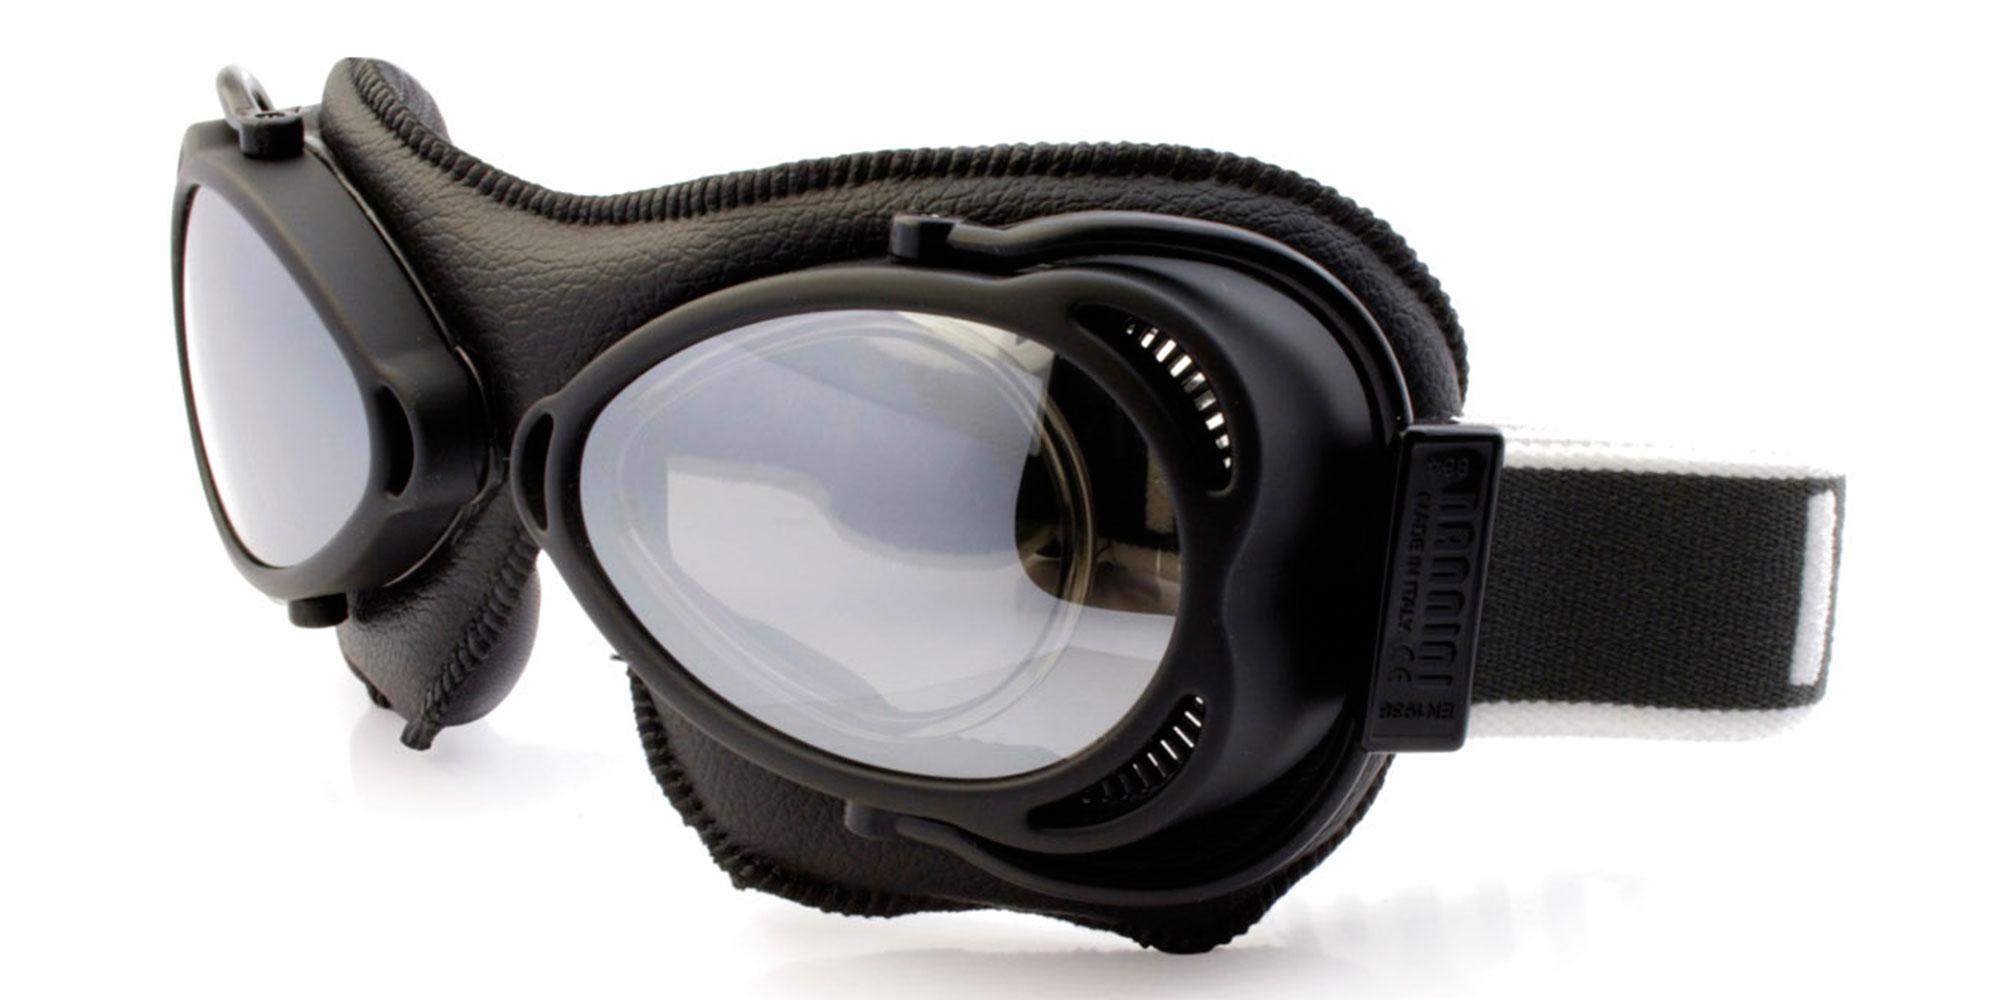 Black Snowfighter Goggles, Sports Eyewear